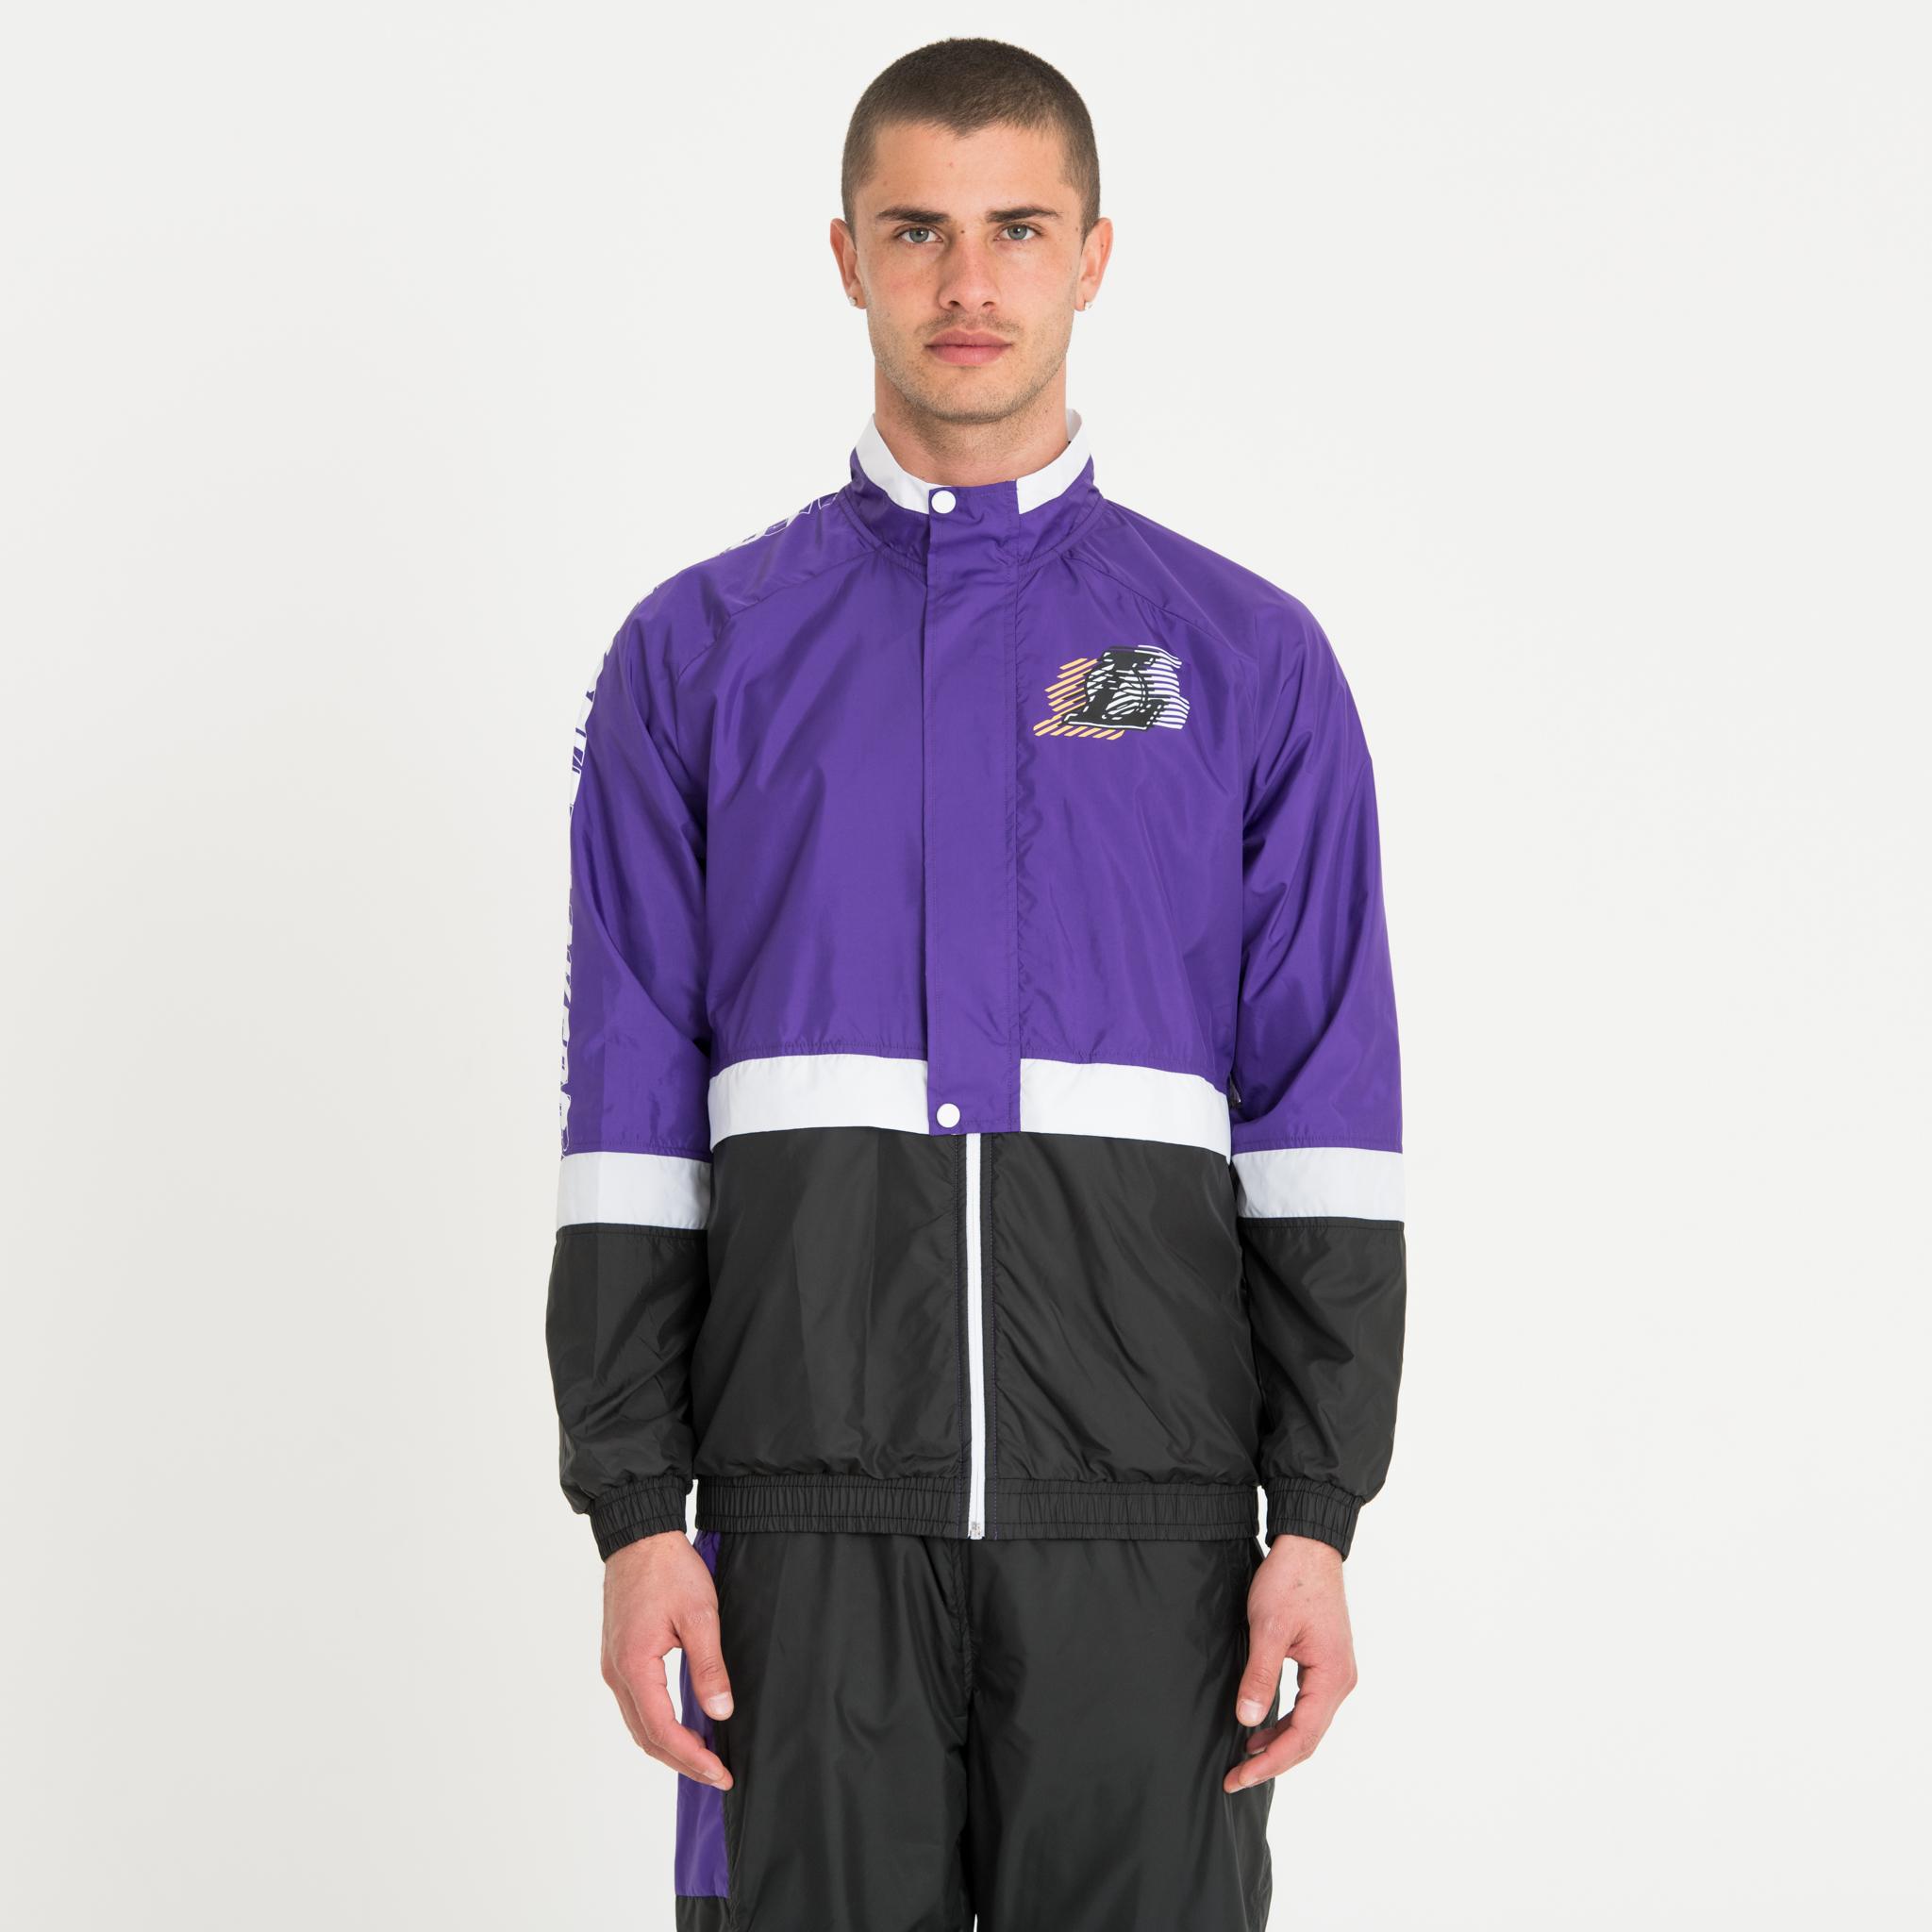 Trainingsjacke der Los Angeles Lakers mit Colour-Block